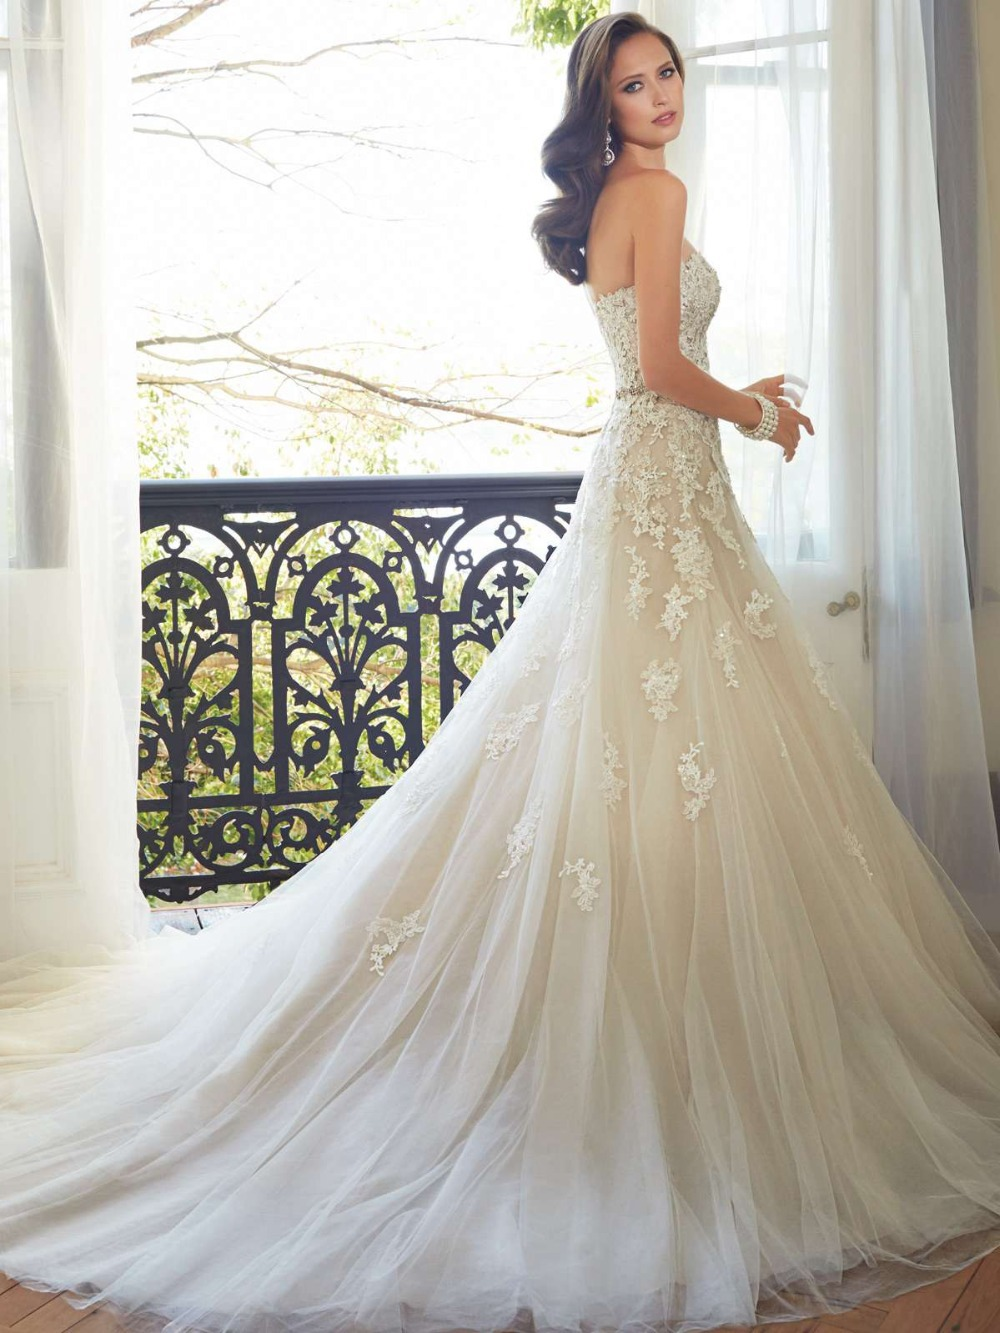 Aliexpress.com : Buy Splendid White Lace Mermaid Wedding Dress ...